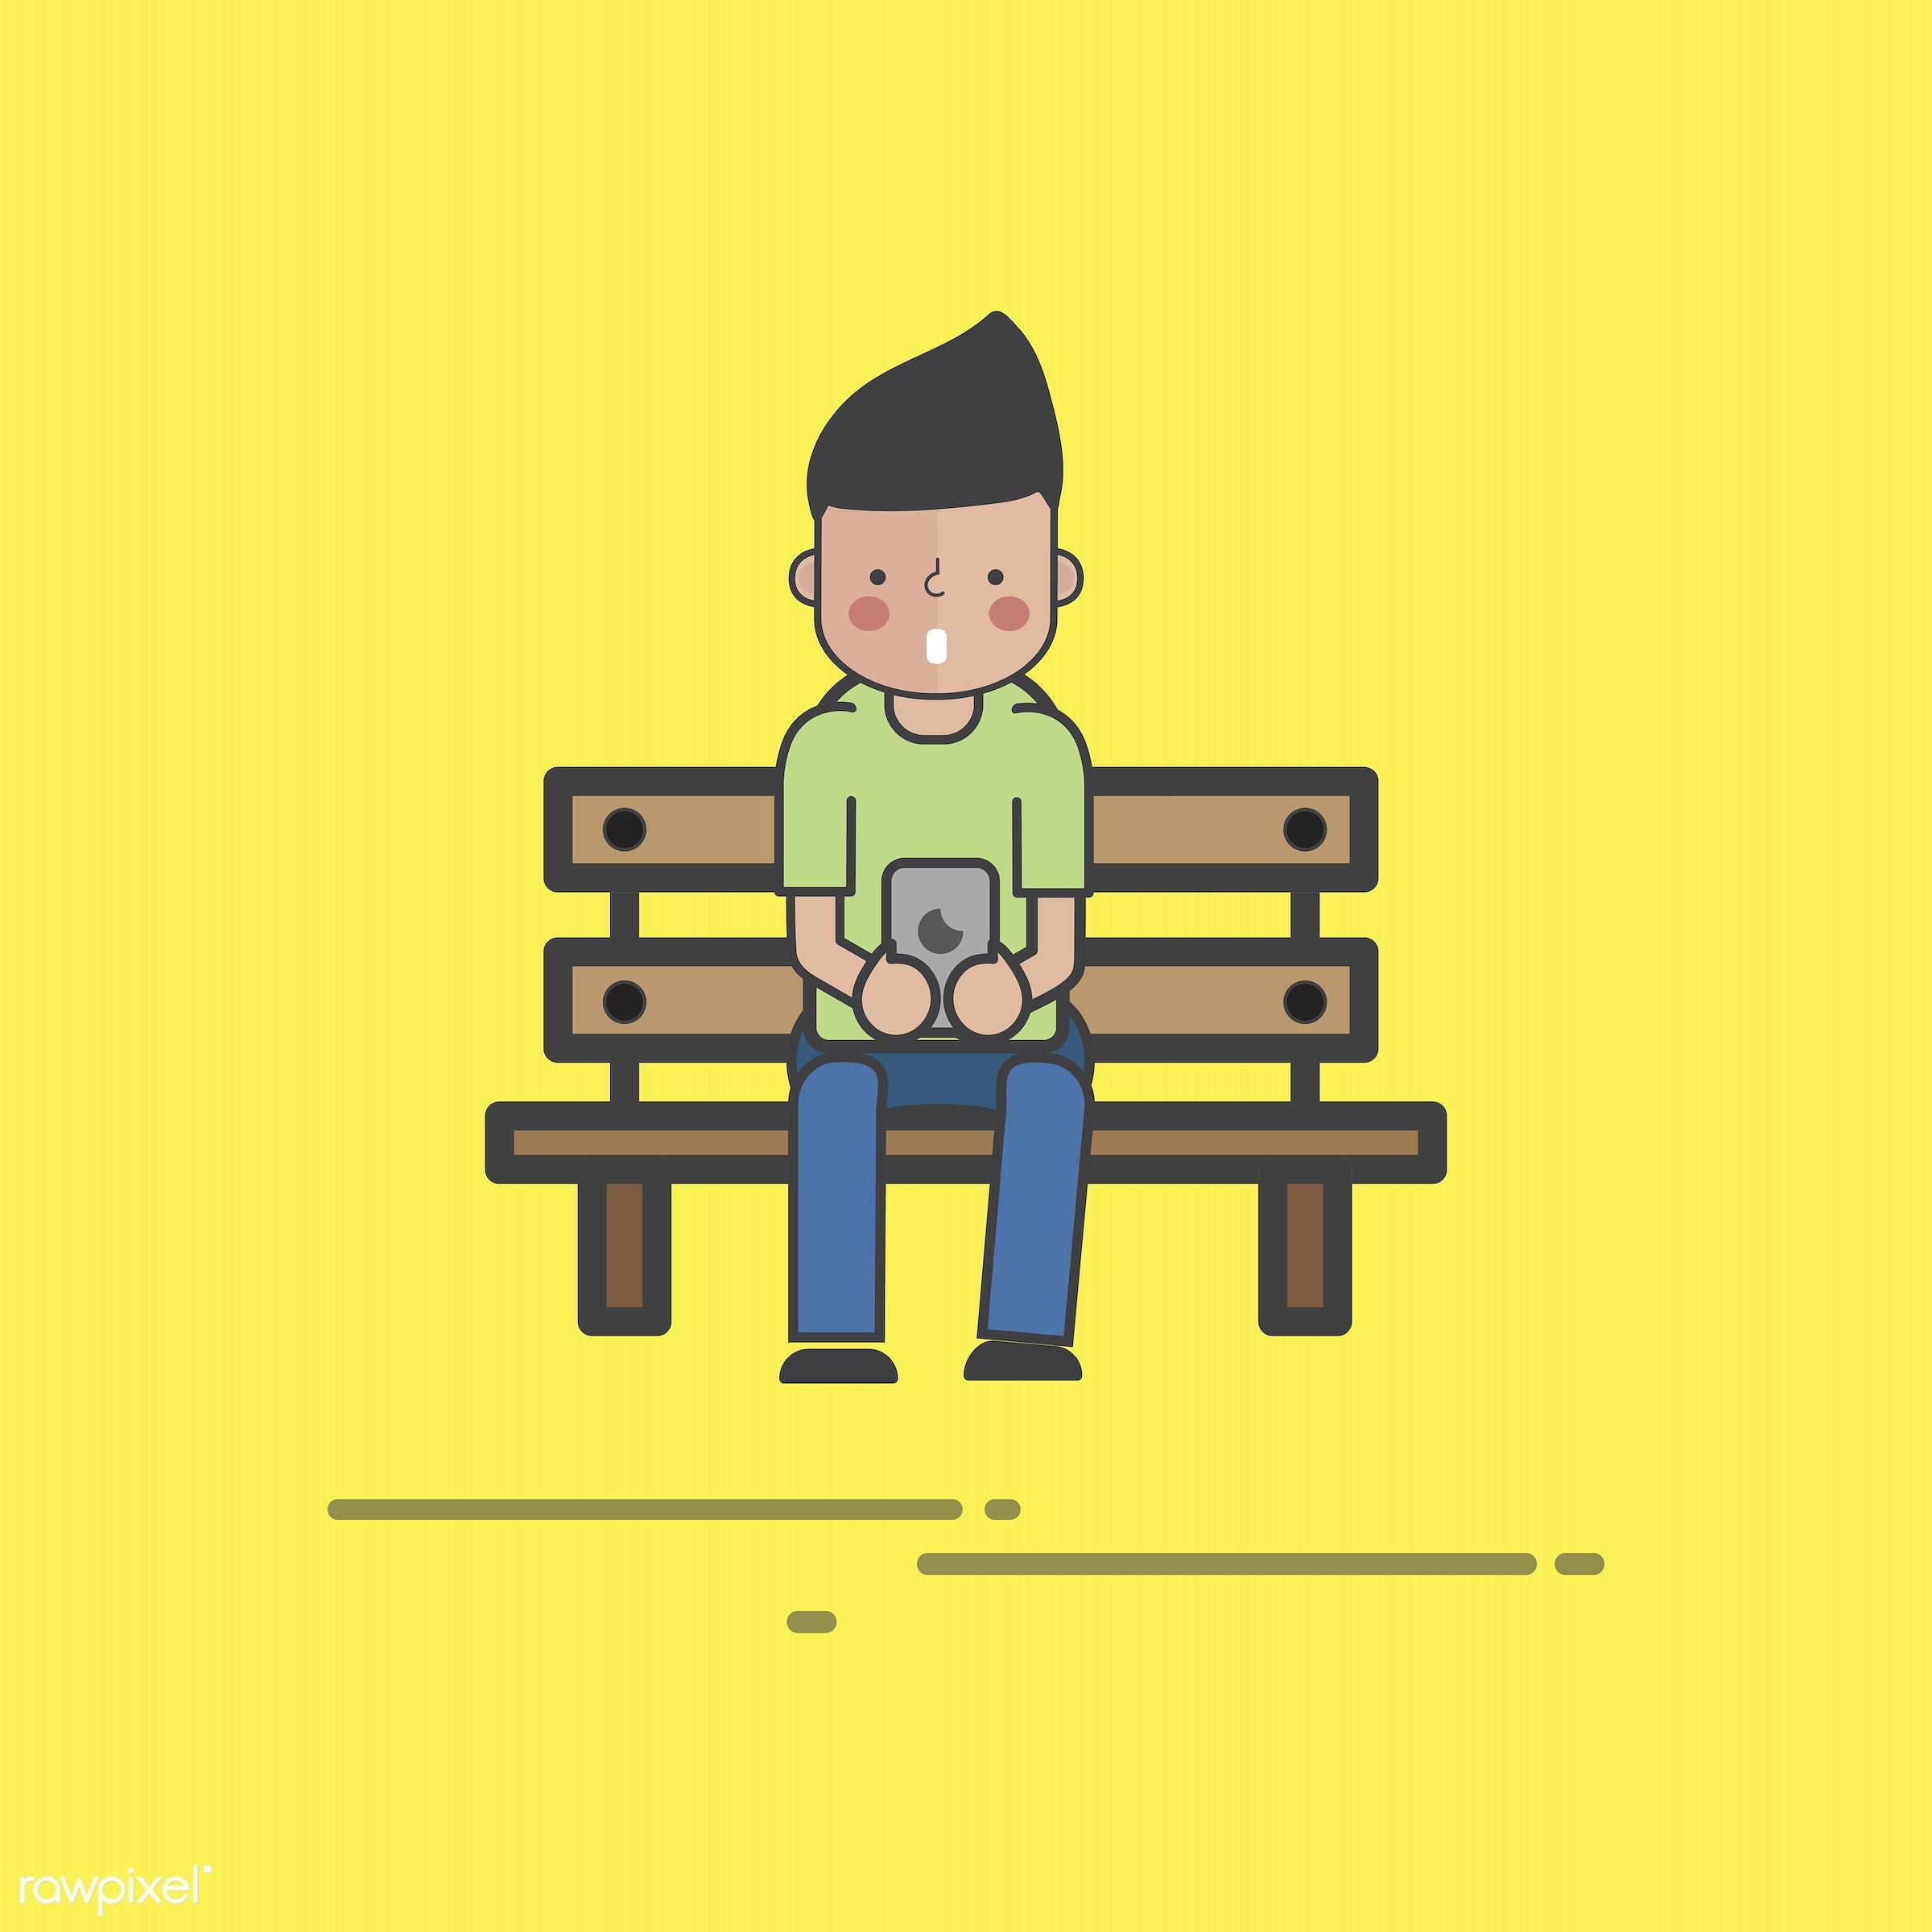 Illustration of people avatar - alone, avatar, cartoon, character, communication, connection, design, device, digital,...